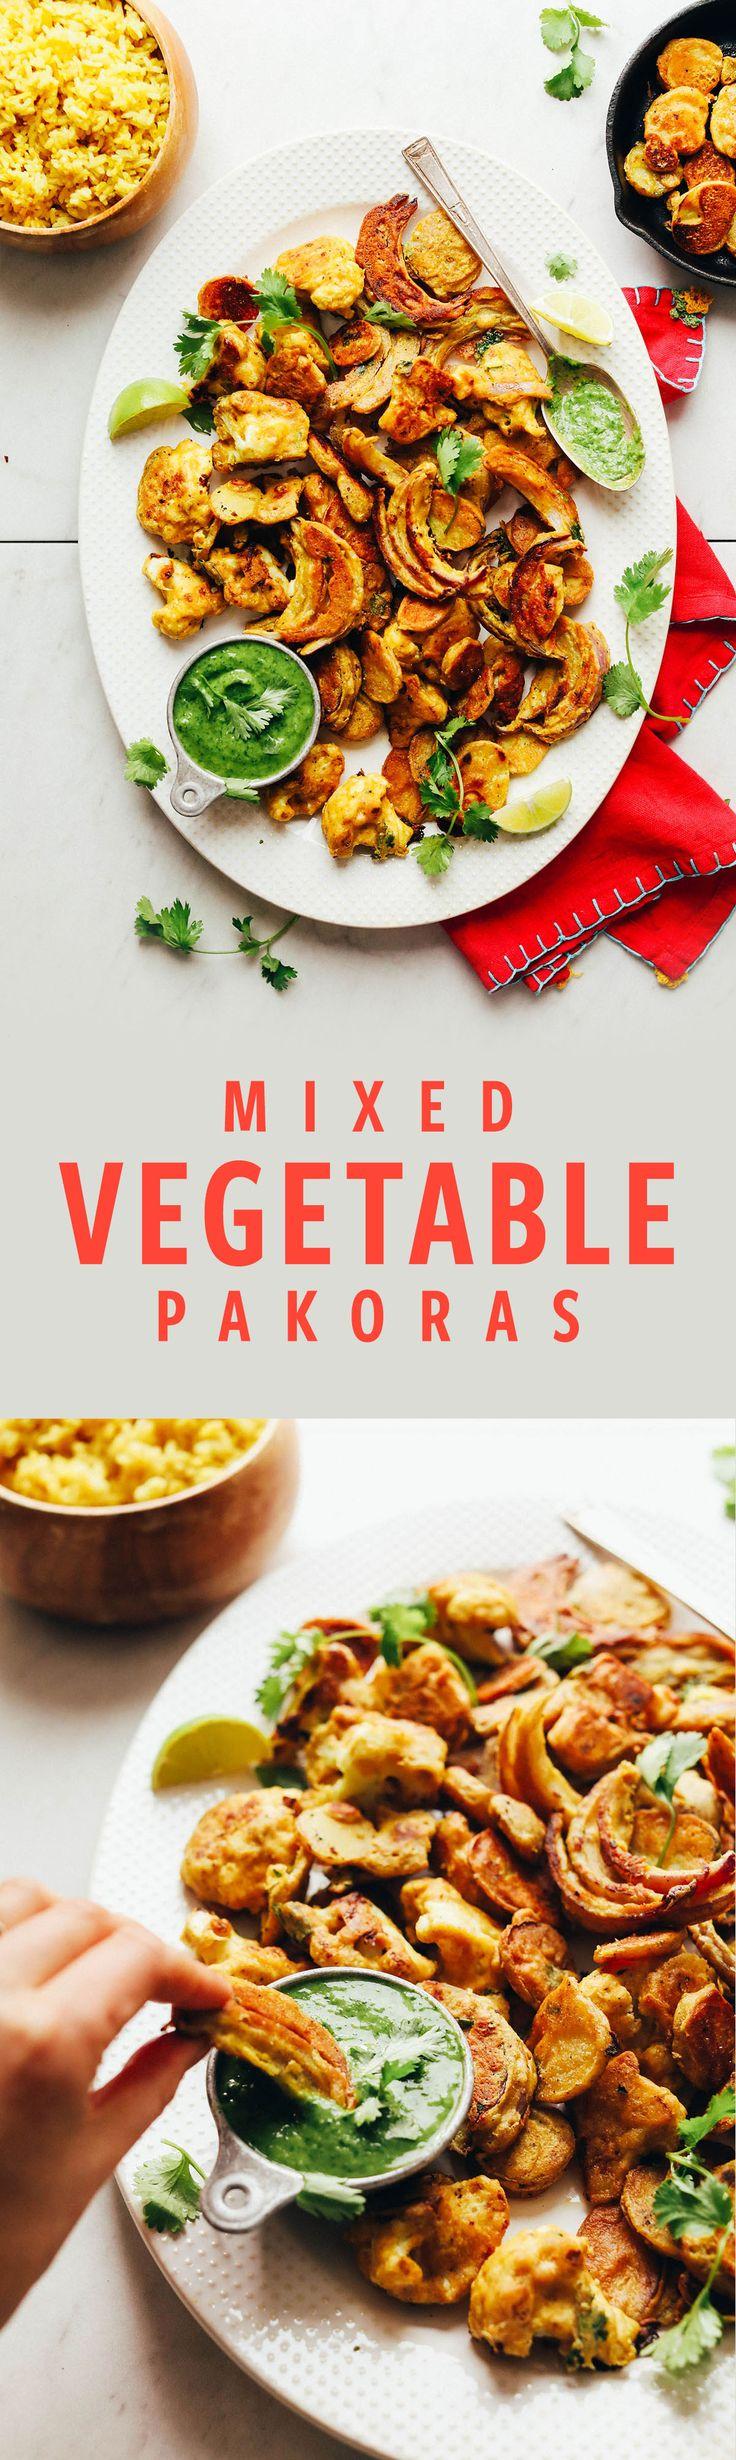 DELICIOUS Vegetable Pakoras in 30 minutes!